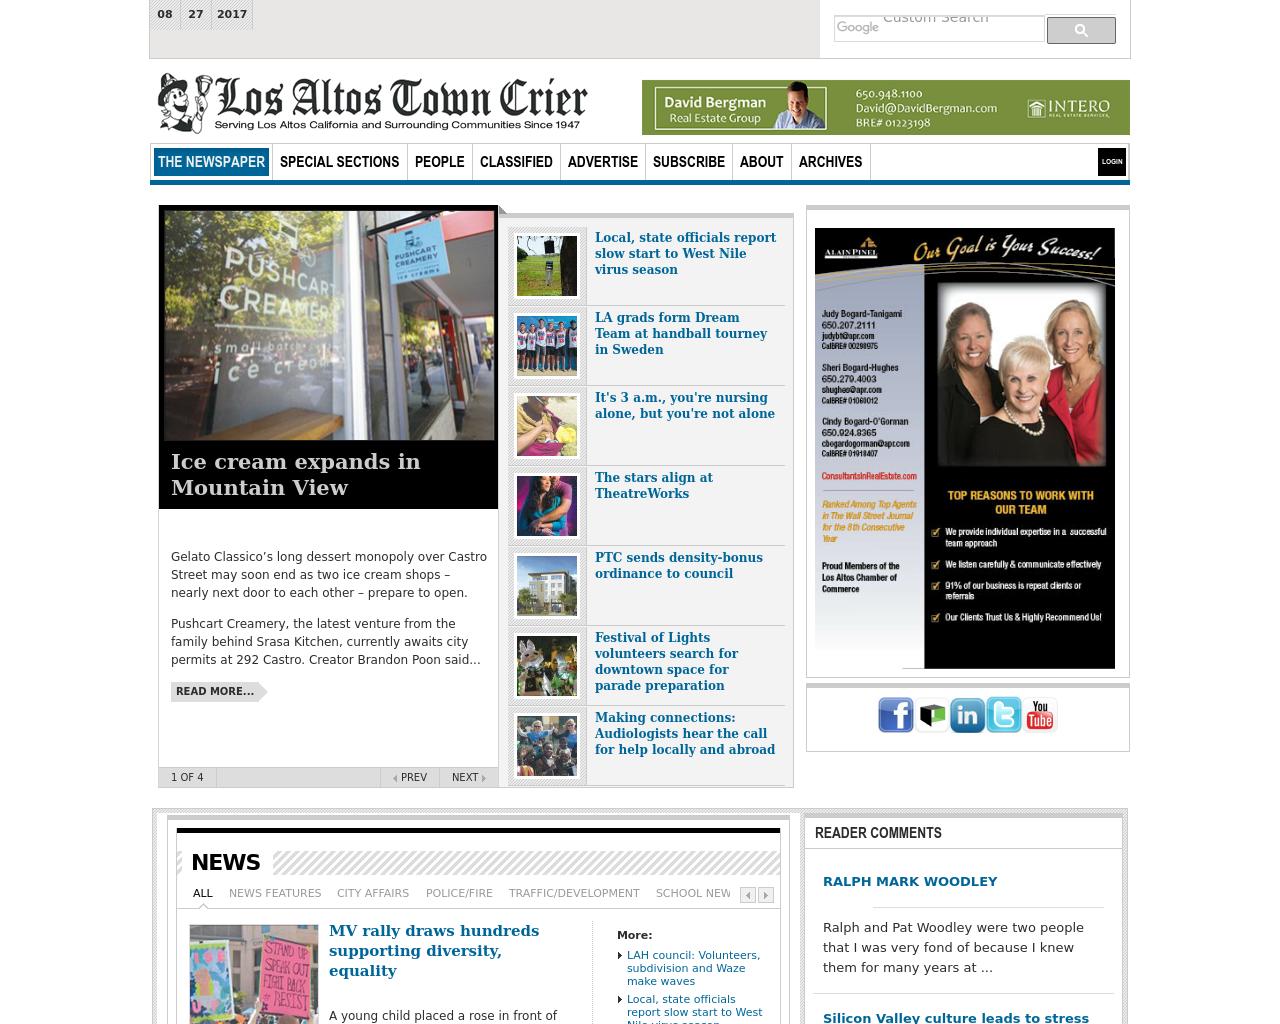 Los-Altos-Town-Crier-Advertising-Reviews-Pricing